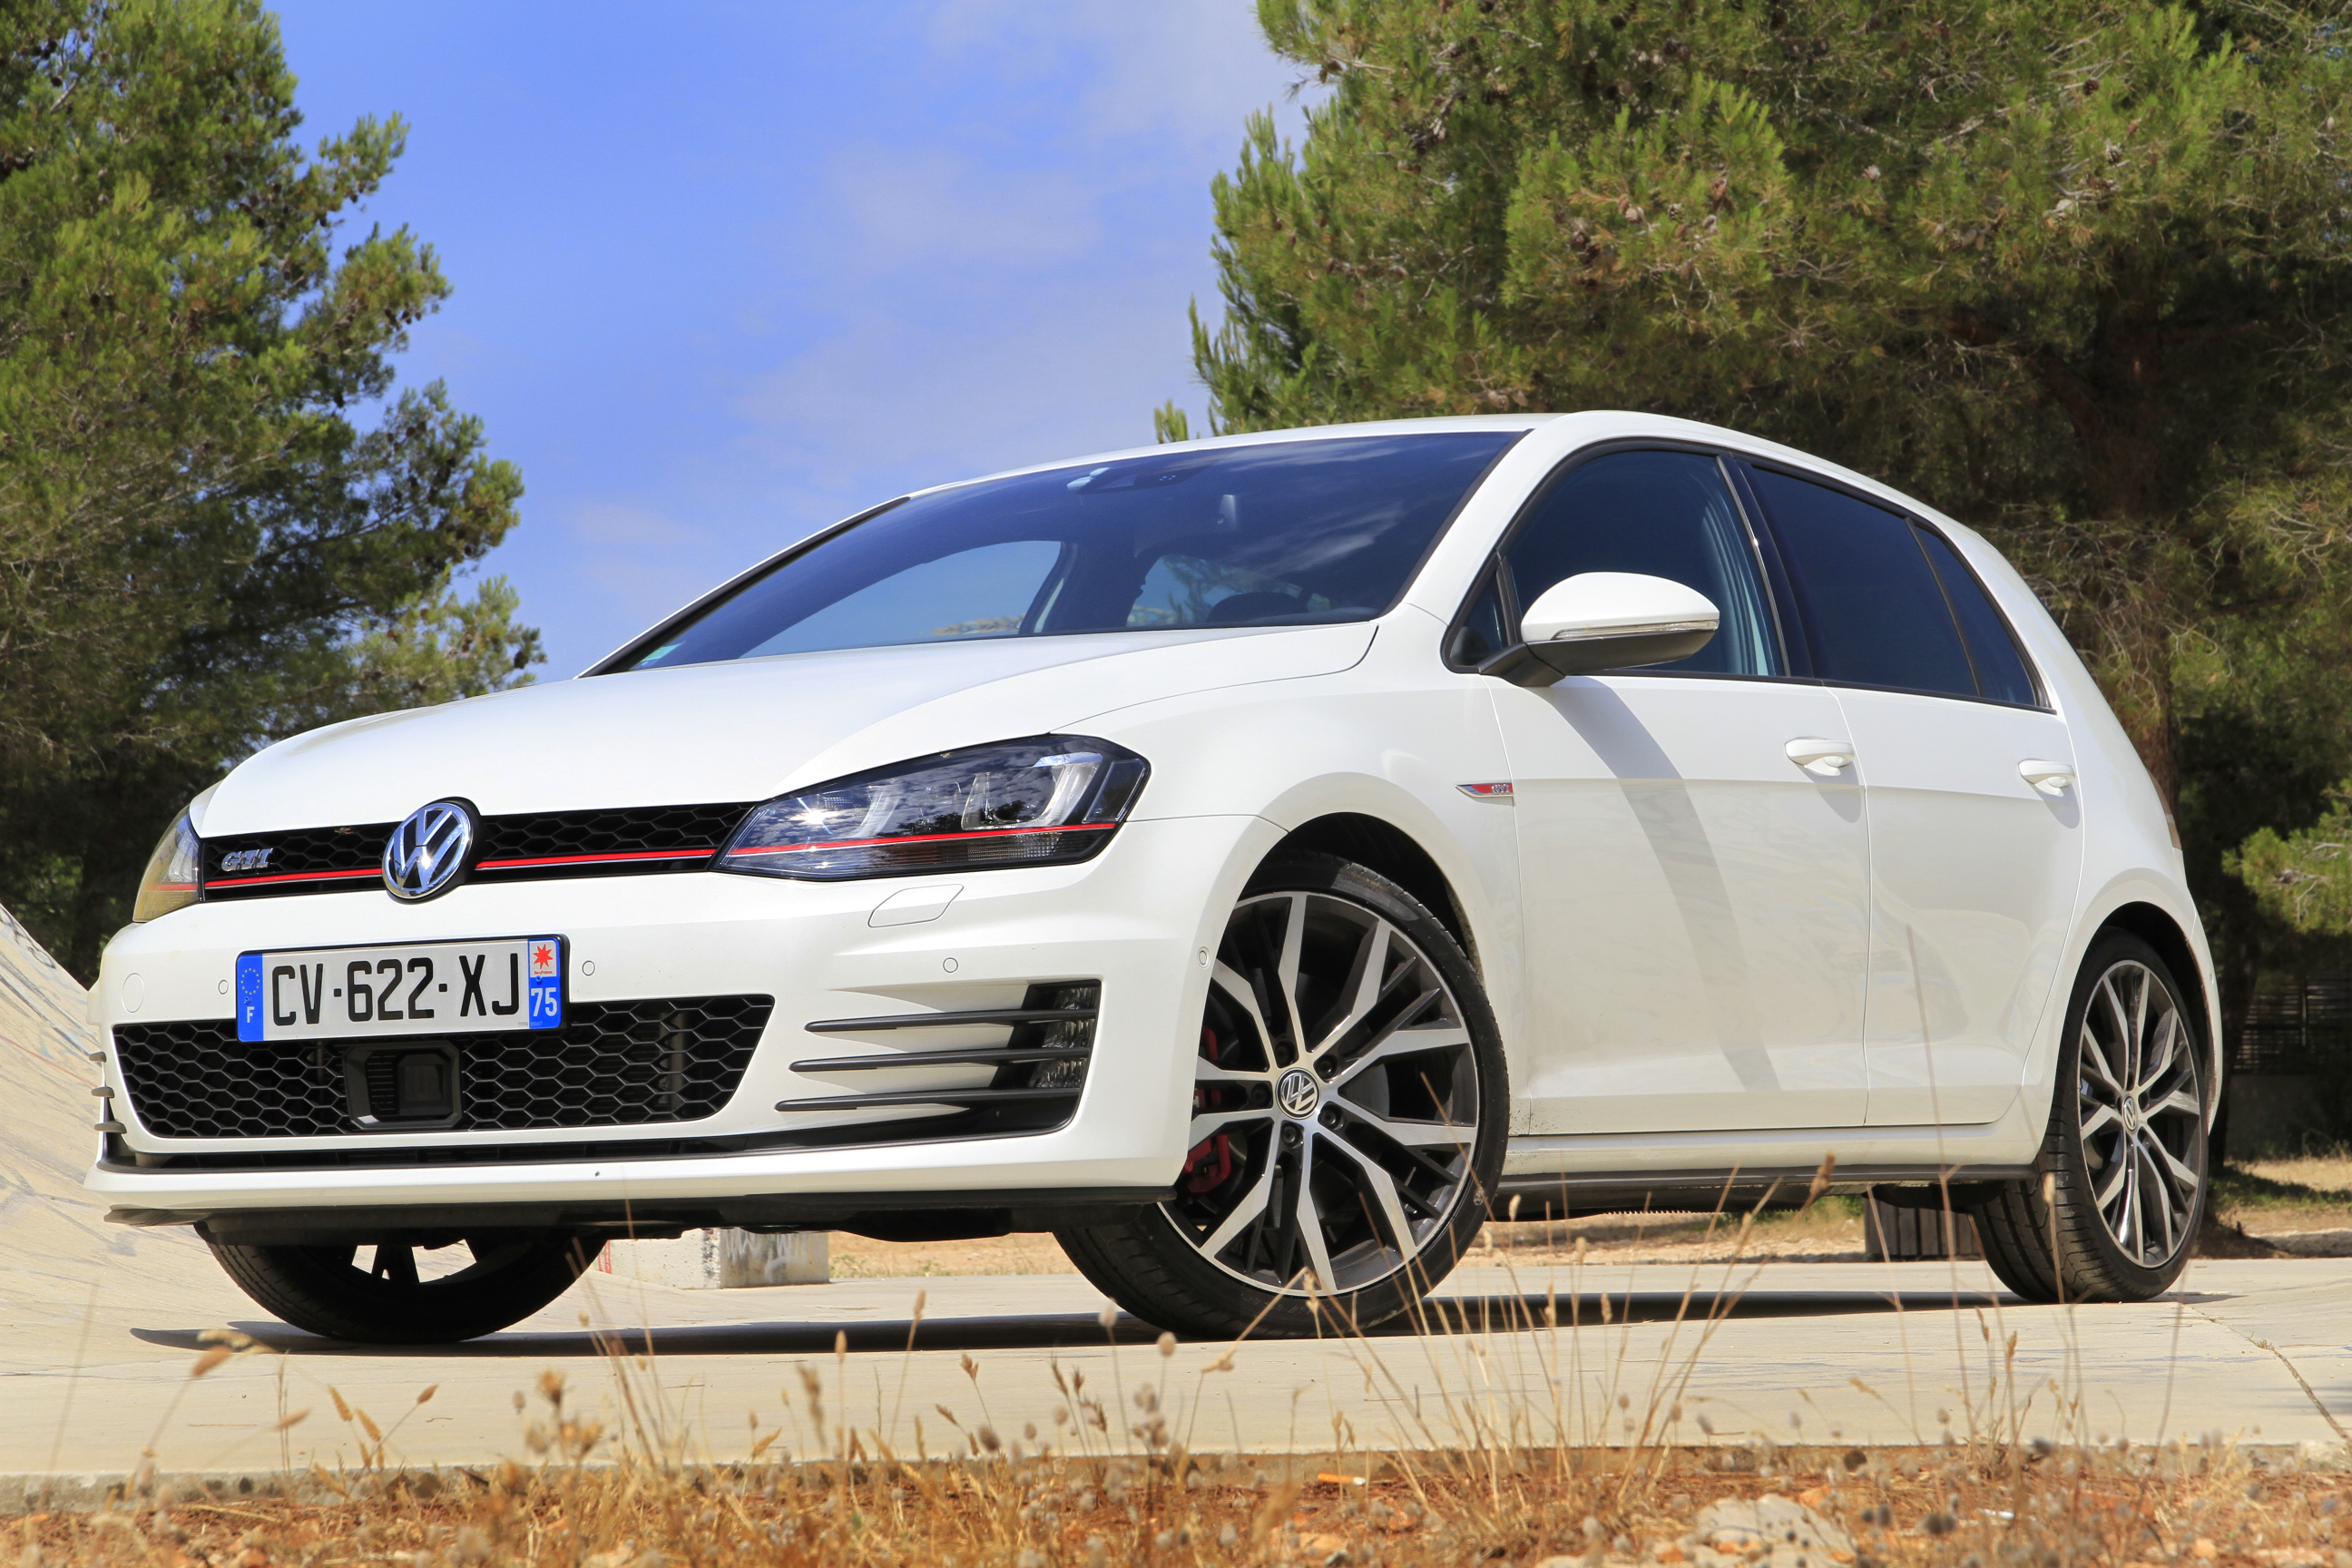 http://images.caradisiac.com/images/7/9/6/0/87960/S0-Essai-video-Volkswagen-Golf-GTI-7-Grand-mere-est-une-rockstar-297841.jpg